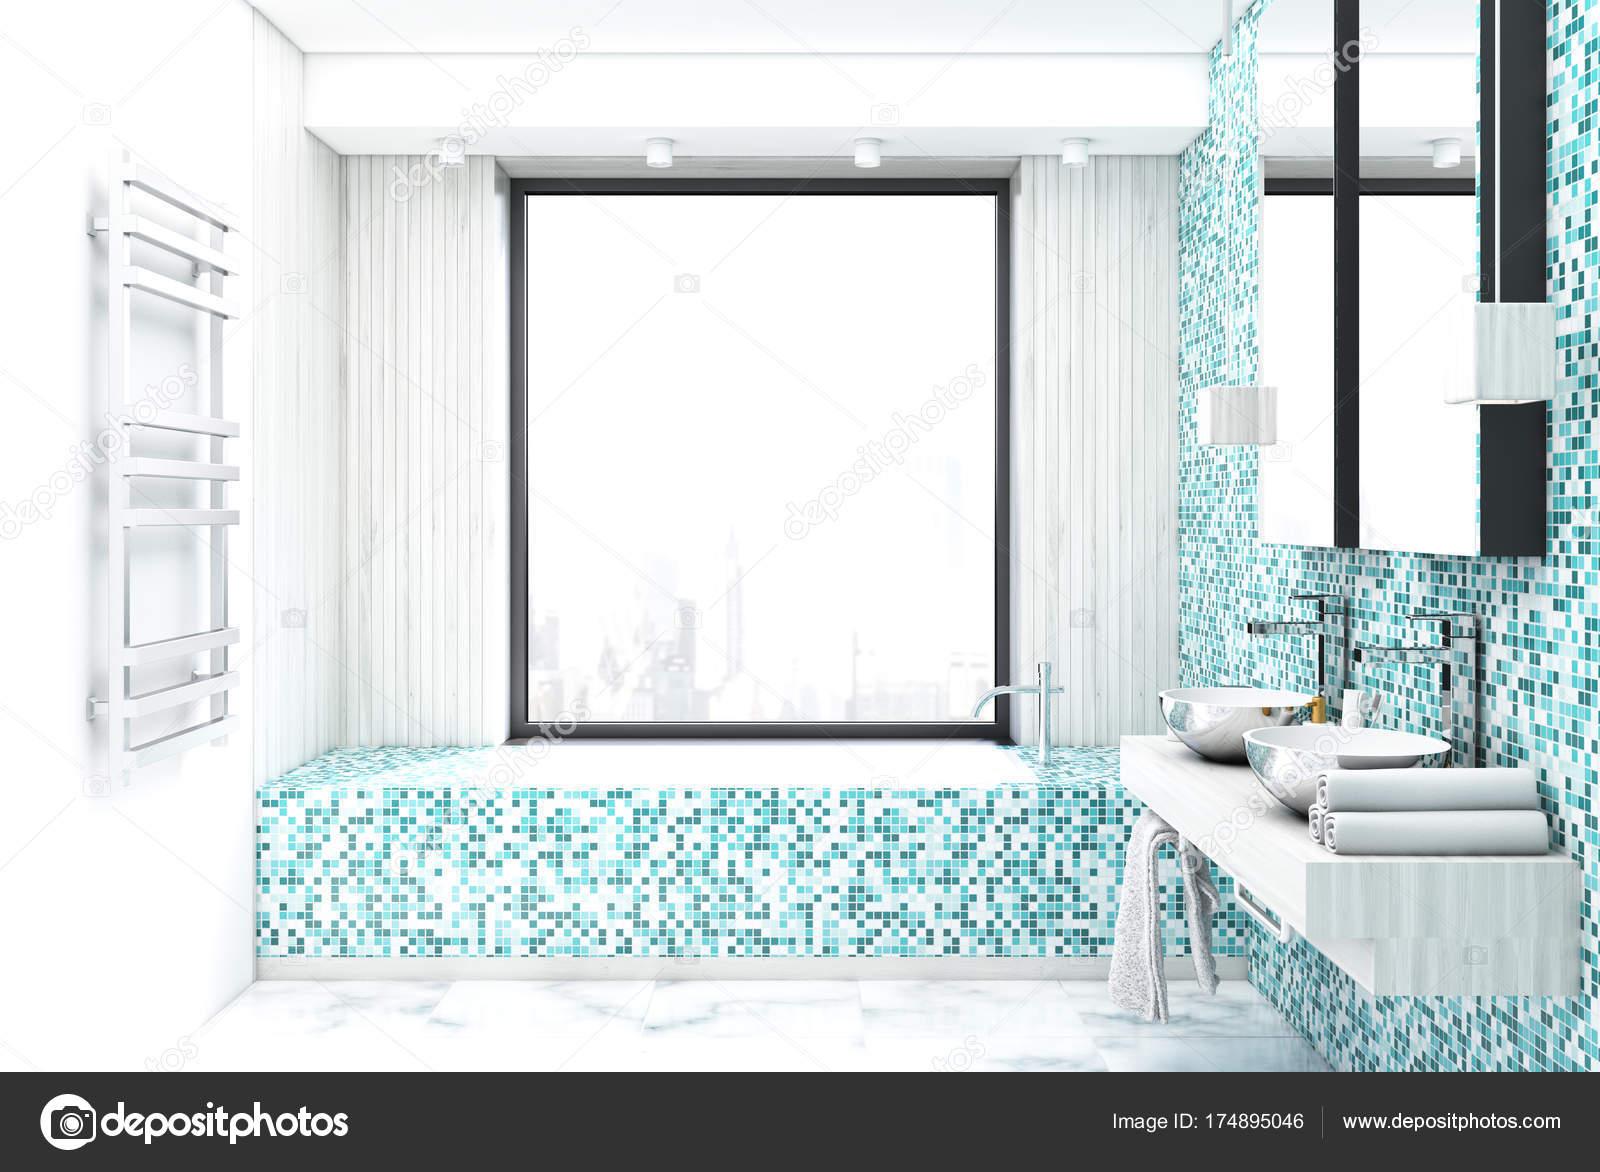 Blaue Fliesen Badezimmer Interieur Stockfoto Denisismagilov